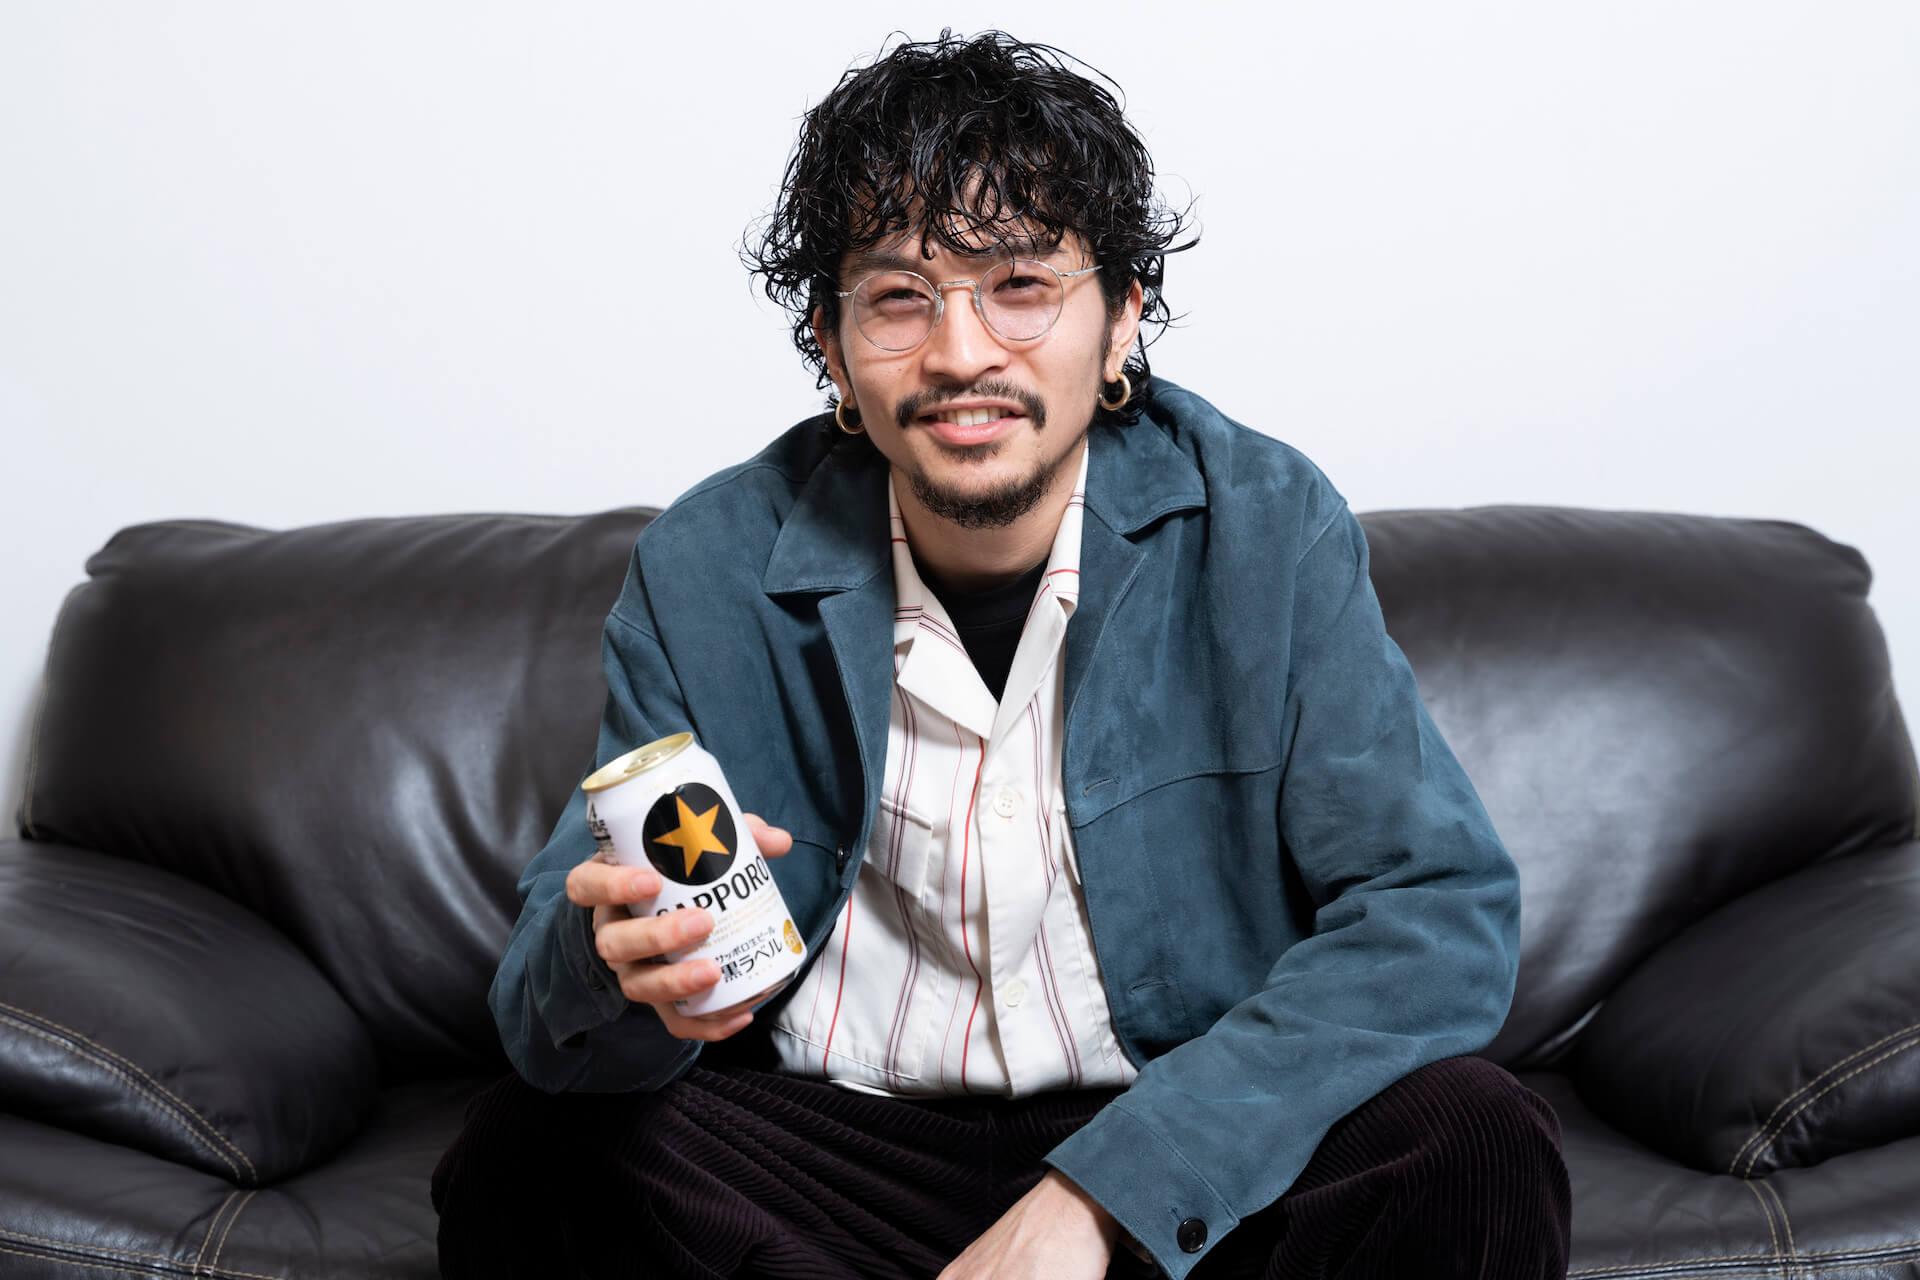 King Gnu常田大希が語る大人とは?サッポロ生ビール黒ラベルのCM「大人エレベーター」に登場! gourmet200327_sapporo_tsuneda_31